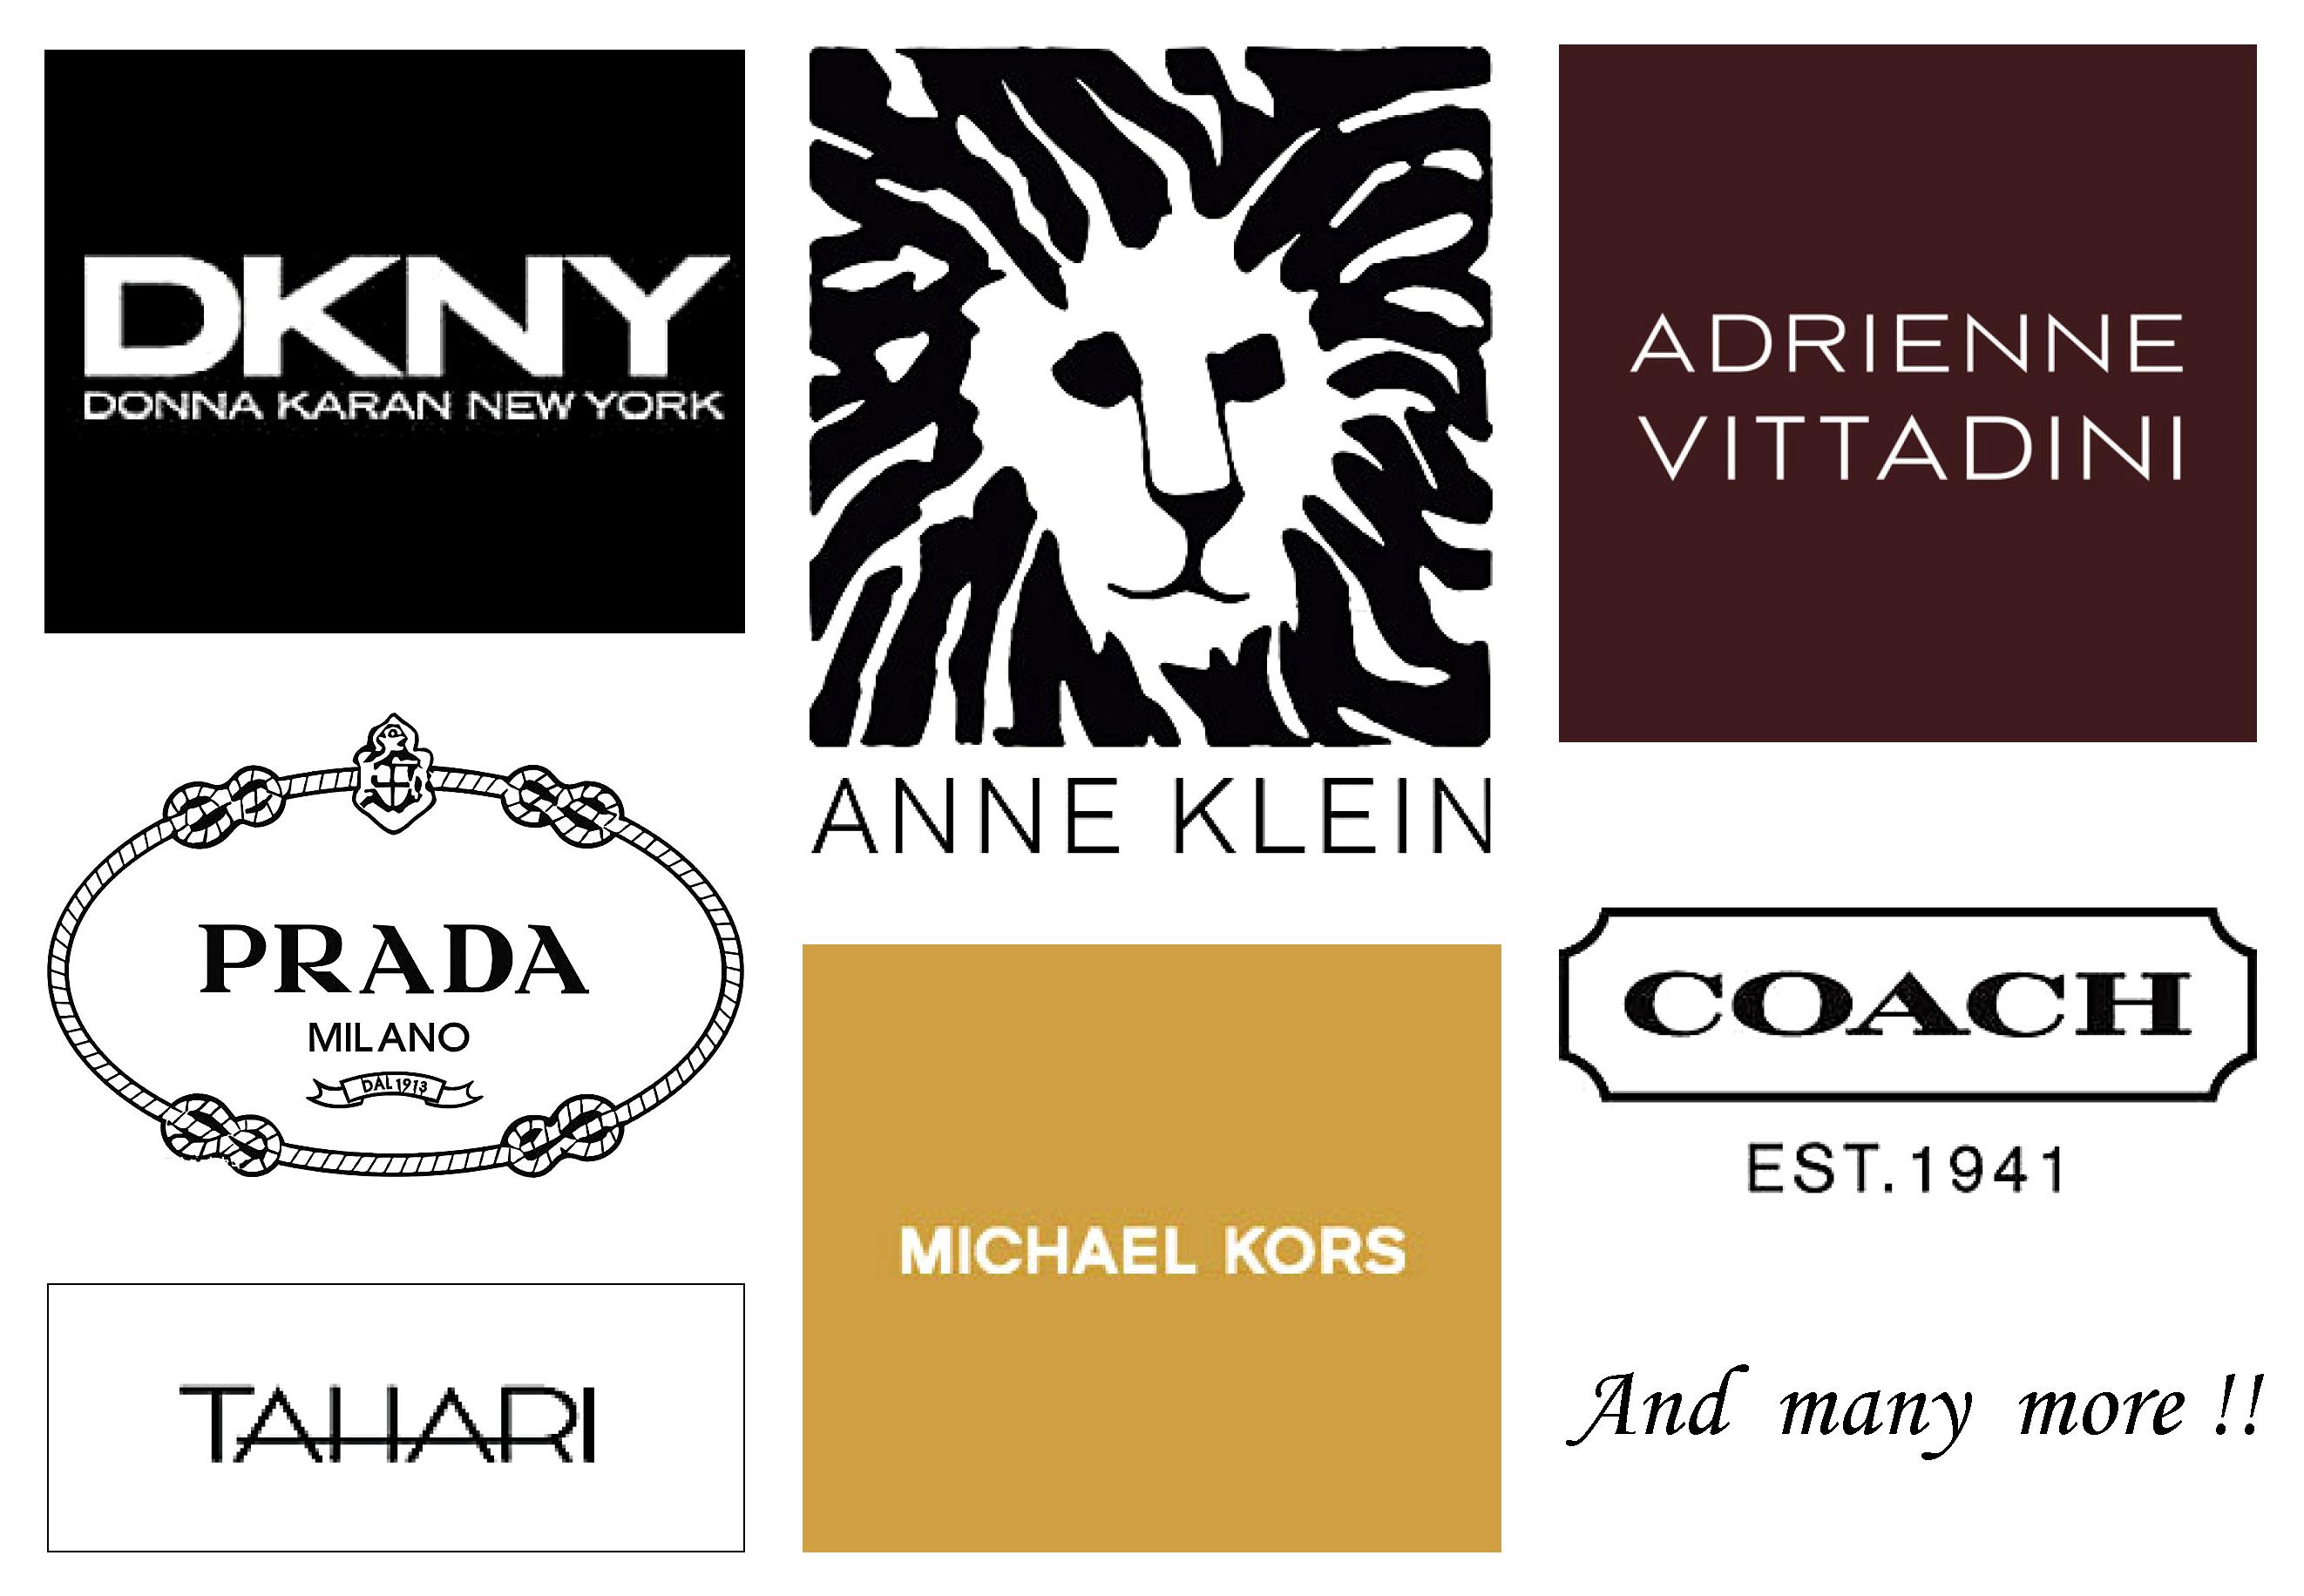 high fashion shoes brands